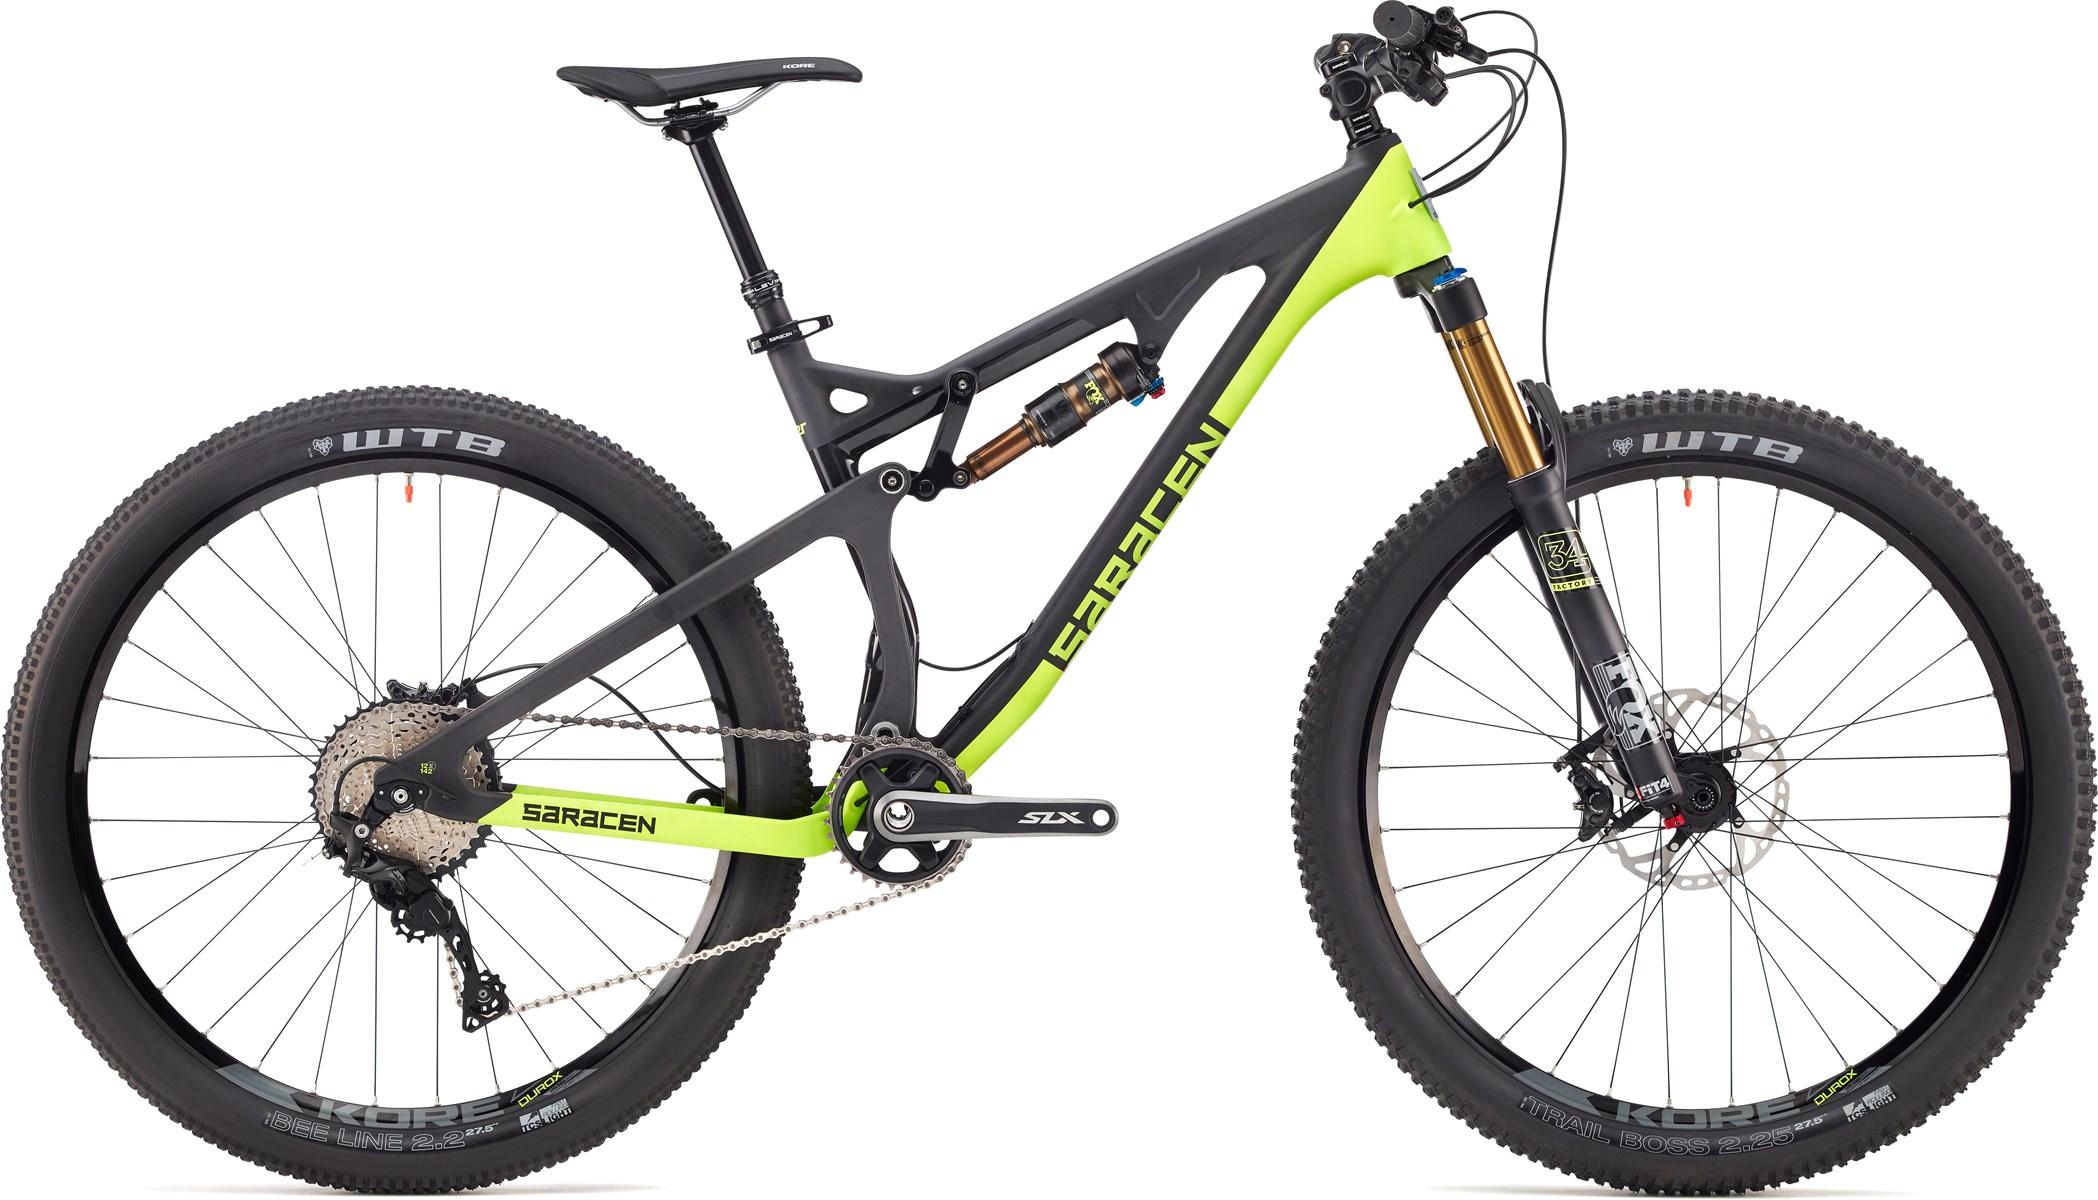 2017 Saracen Kili Flyer Elite Full Suspension Mountain Bike 3 699 99